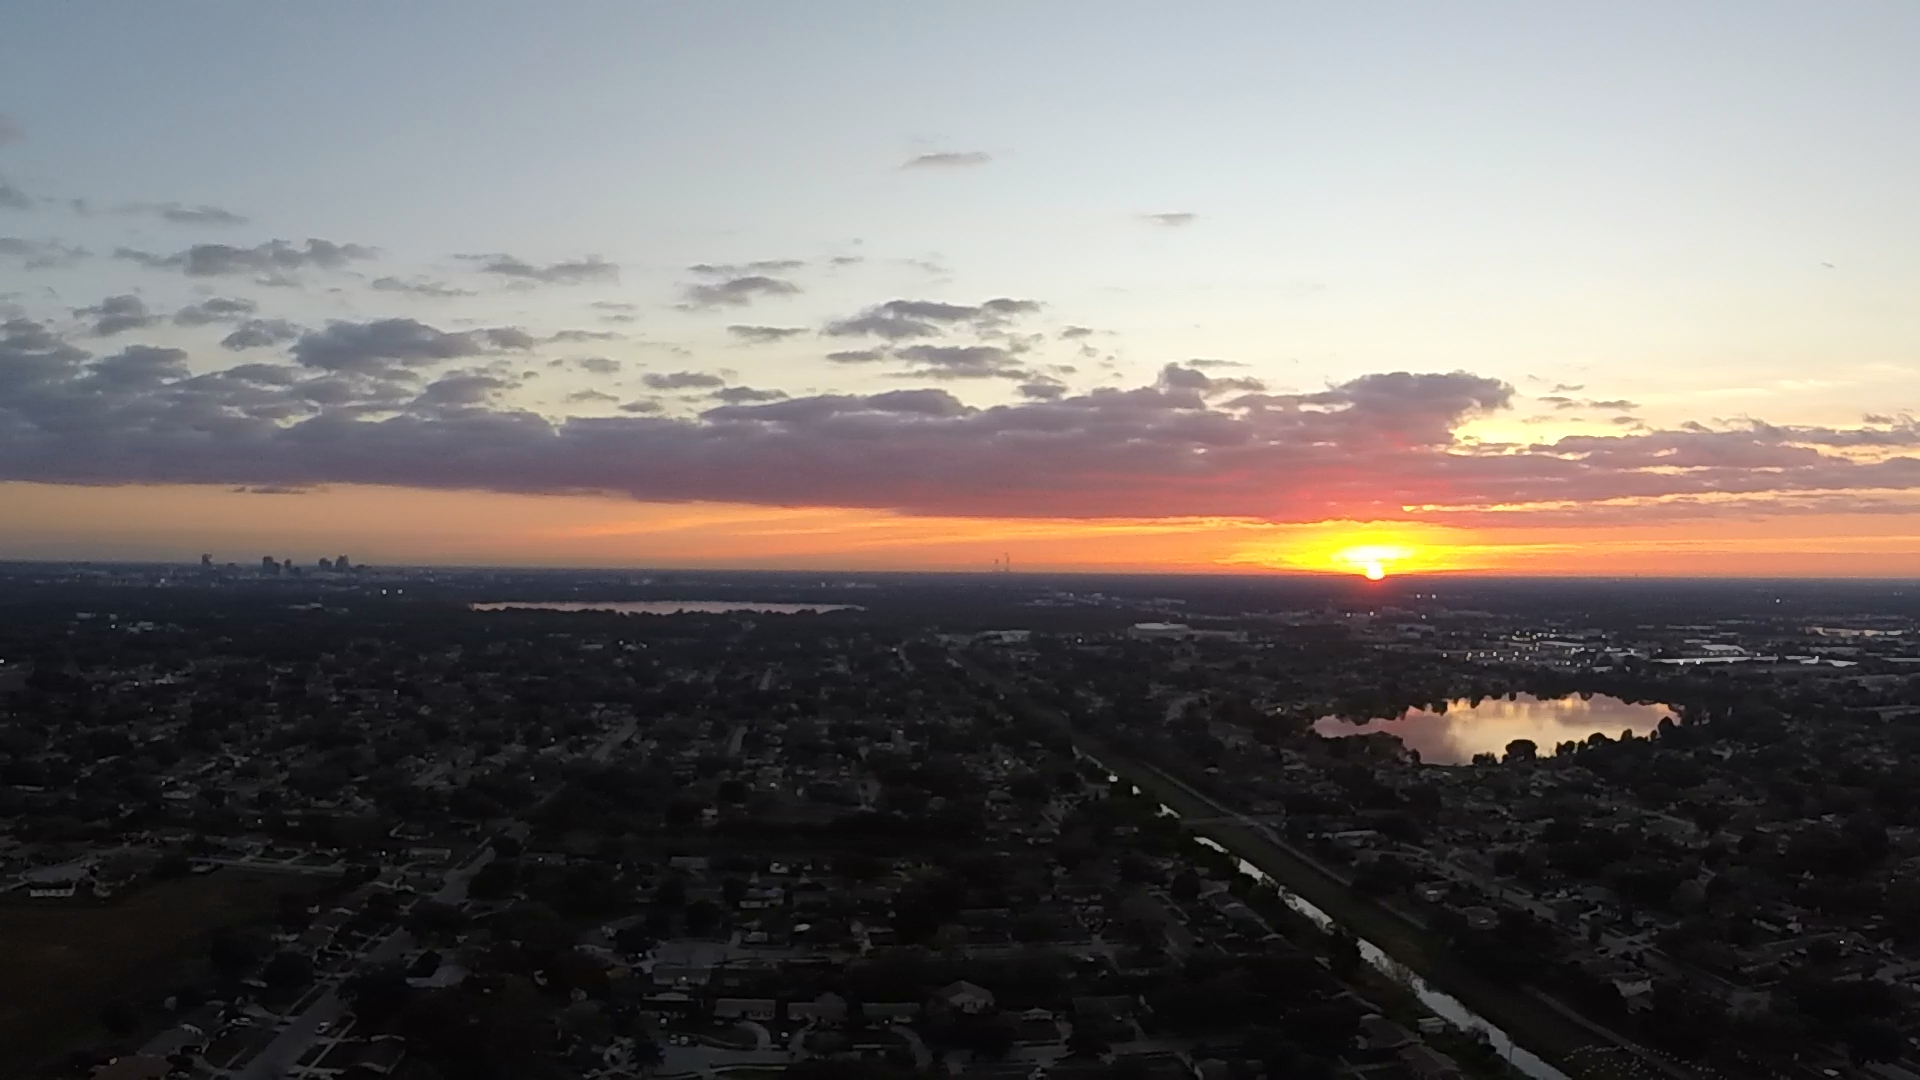 Sunrise over Orlando - 1/5/17 - 3DR Solo Quadcopter and GoPro Hero 3+ Silver